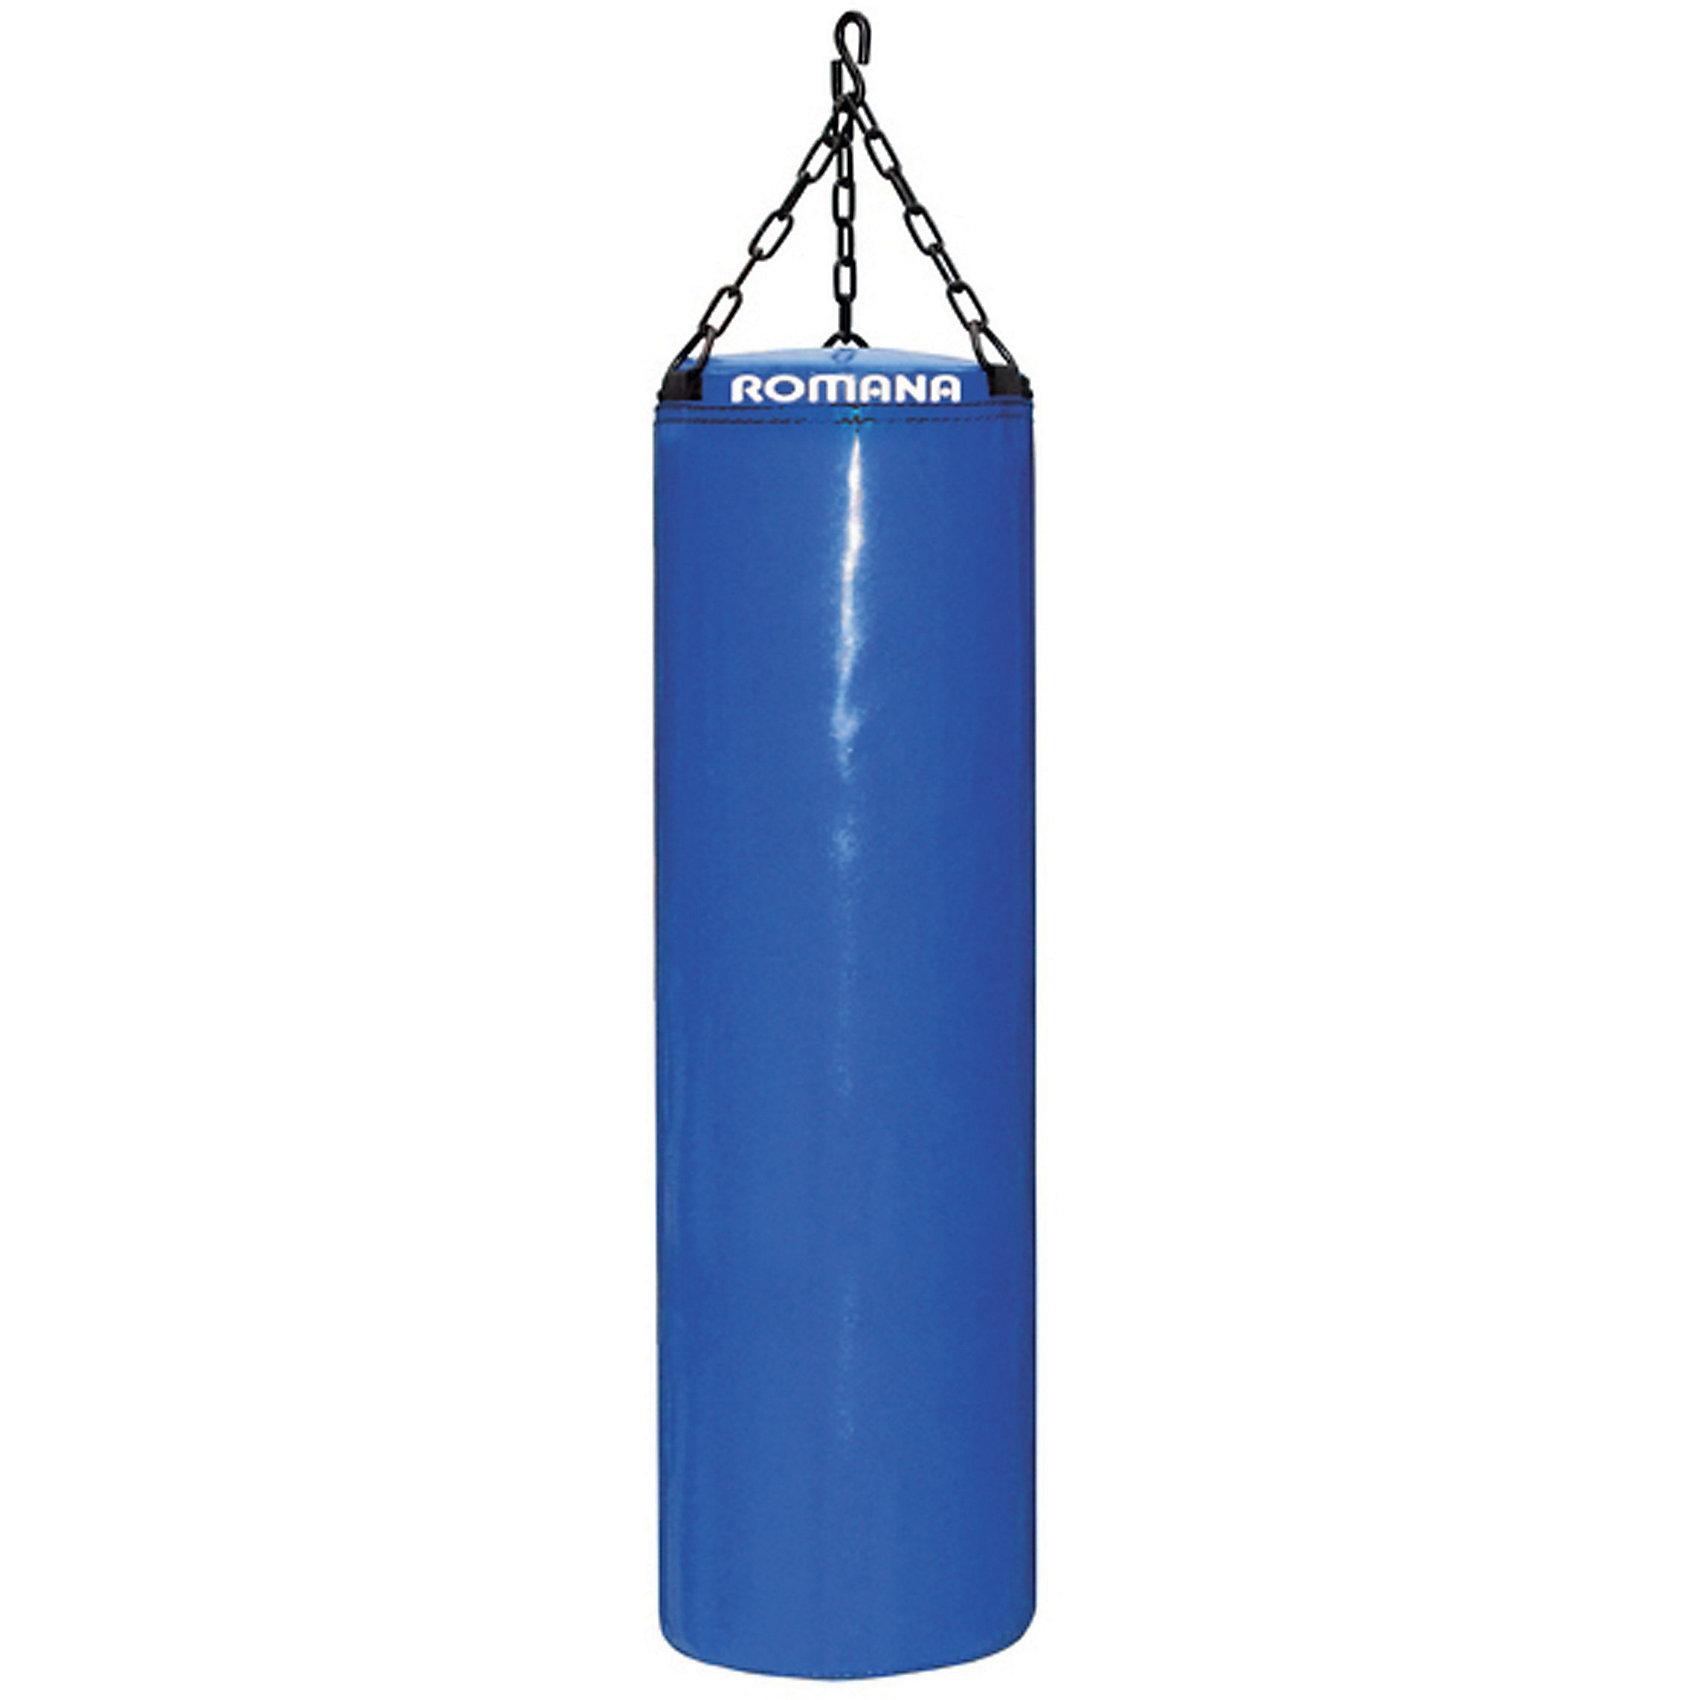 Мешок боксерский, вес 12кг, ROMANA от myToys